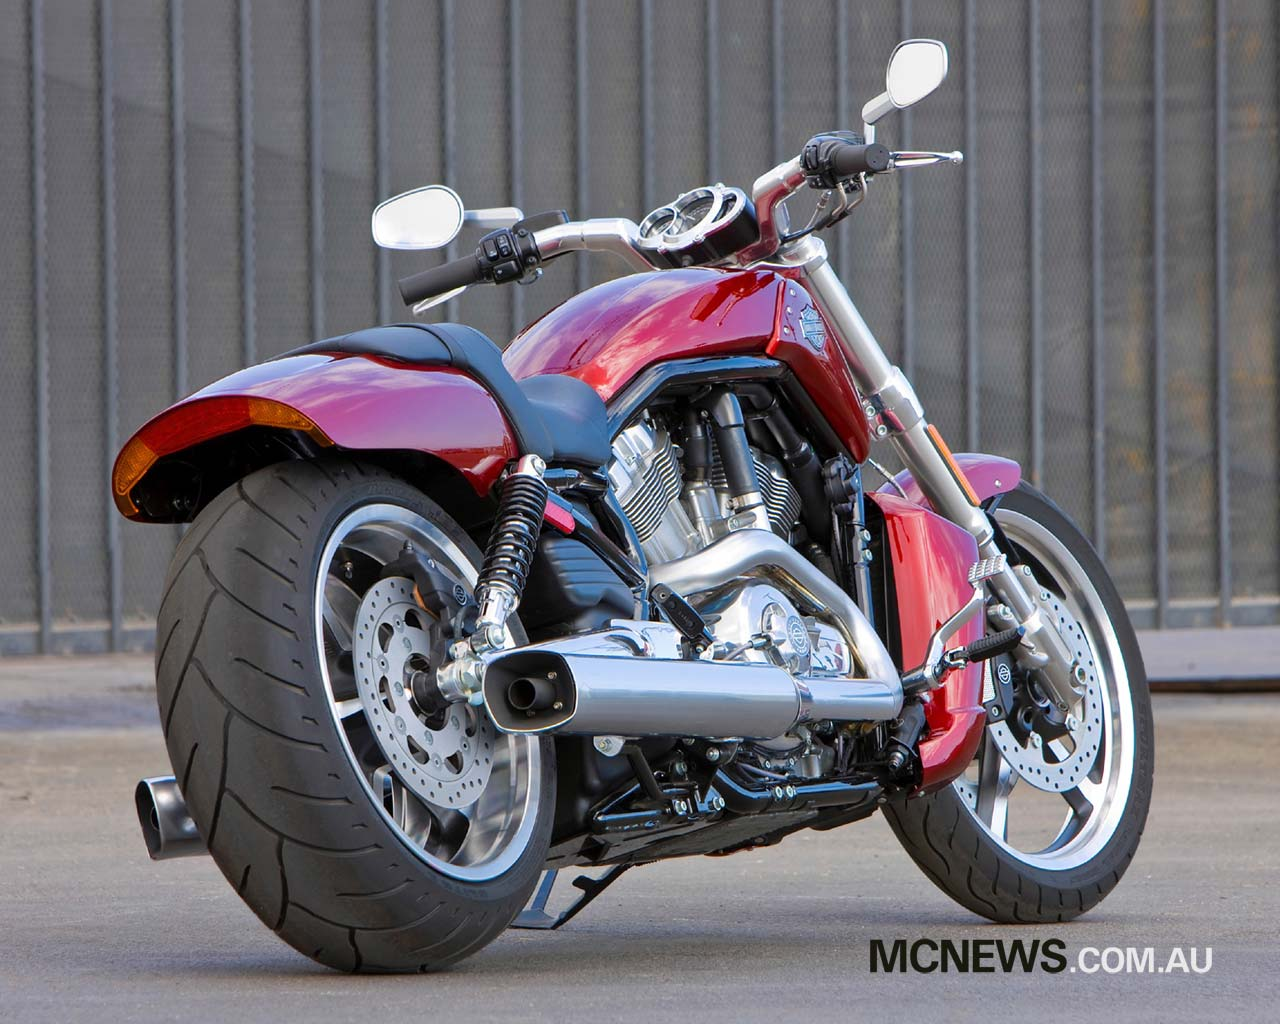 Harley Davidson V Rod Muscle Wallpapers 1280x1024